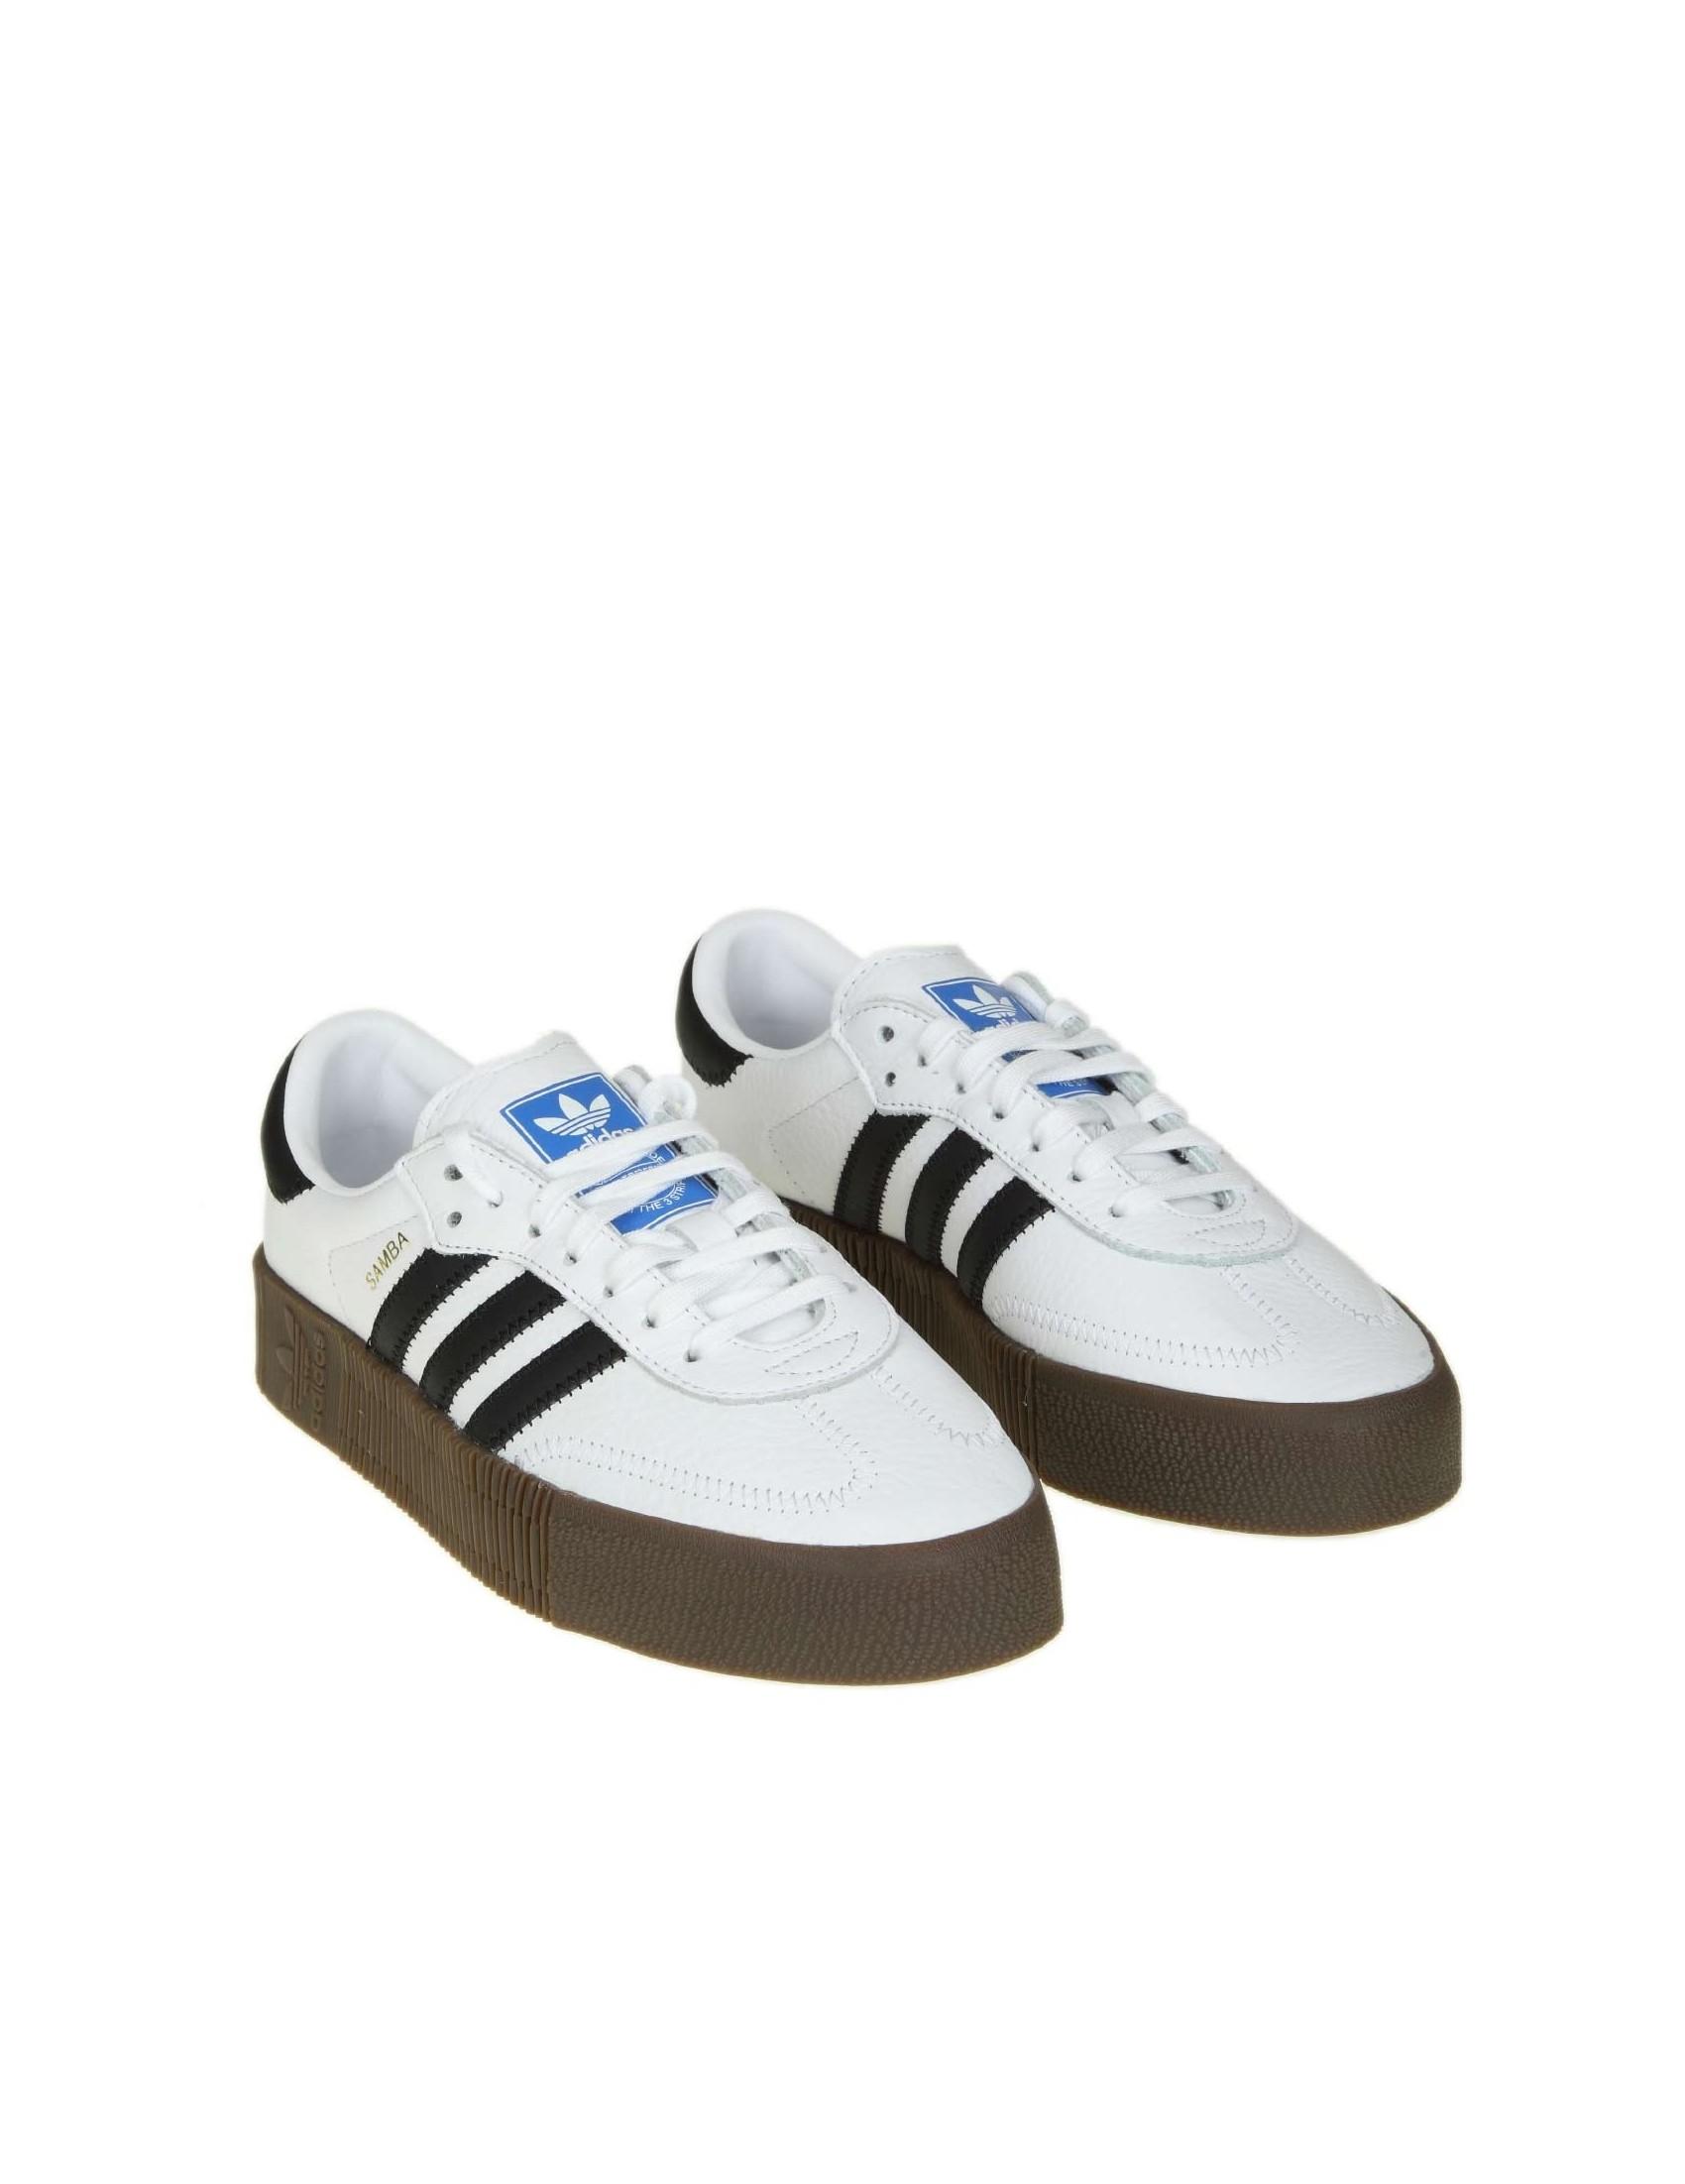 5fe62015f1 Originals Adidas Colore Pelle Sambarose Bianco In vddwfRzq